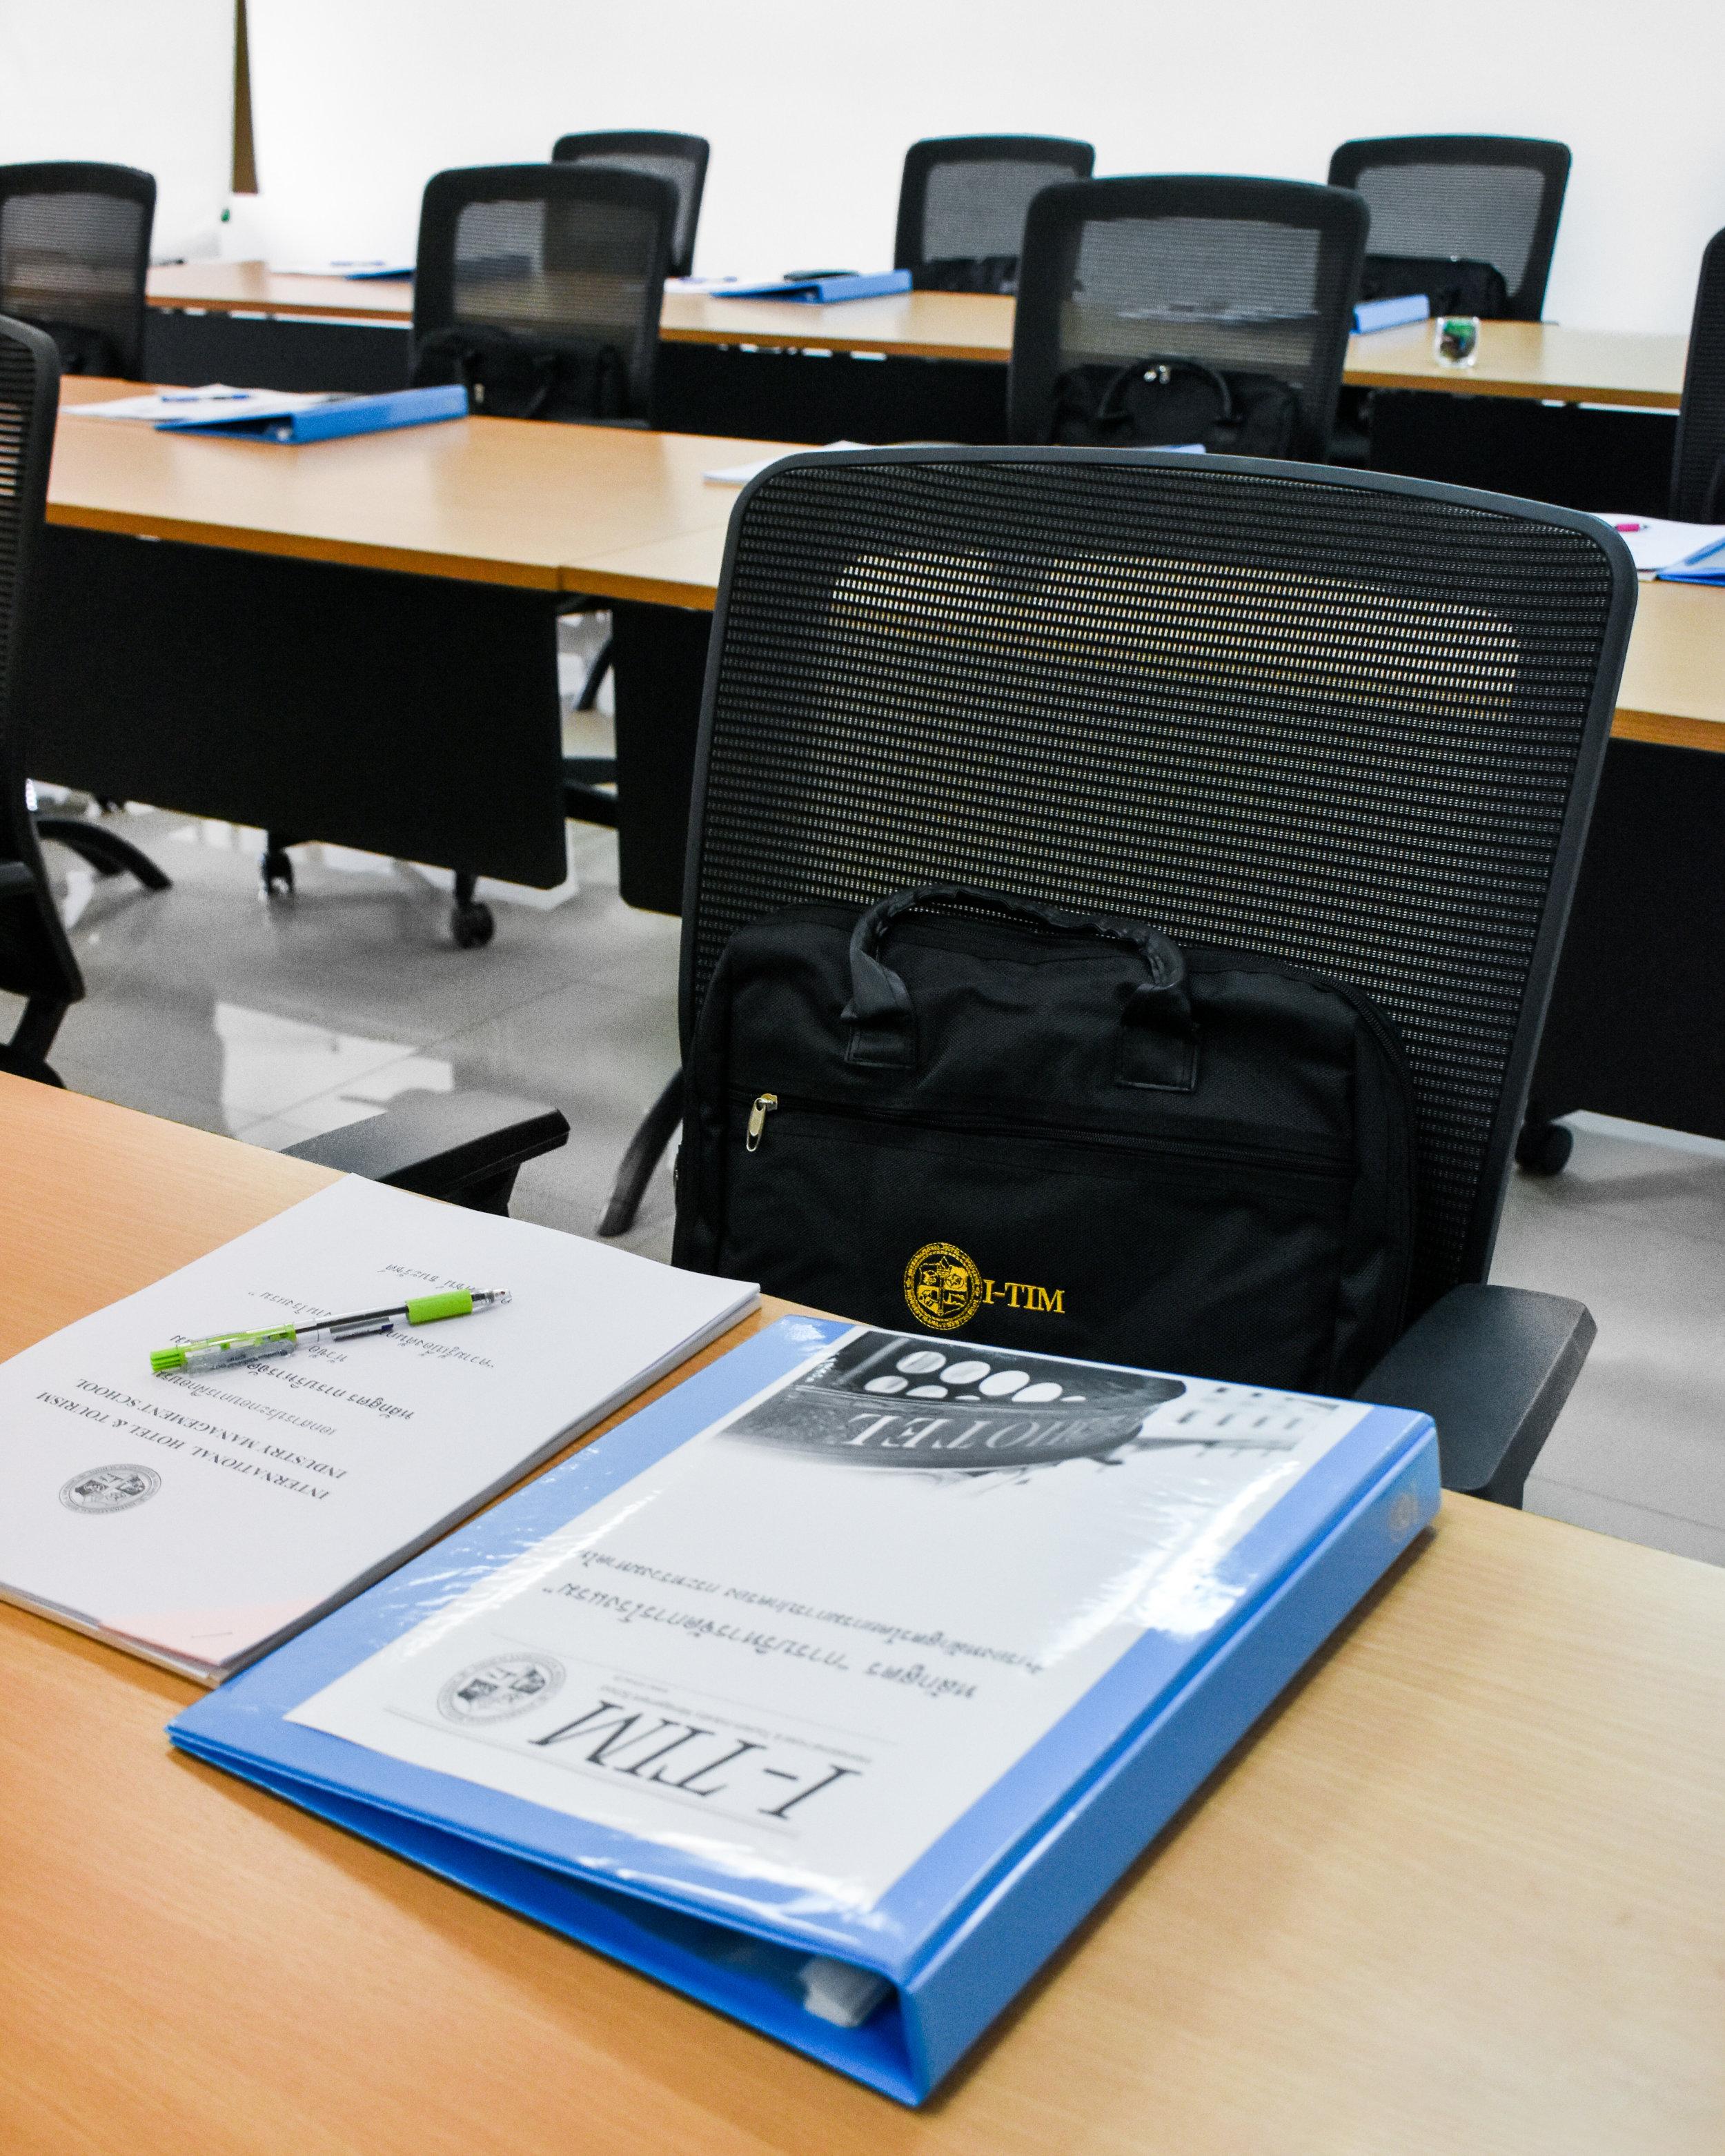 short course classroom 2 fixed (1 of 1).jpg